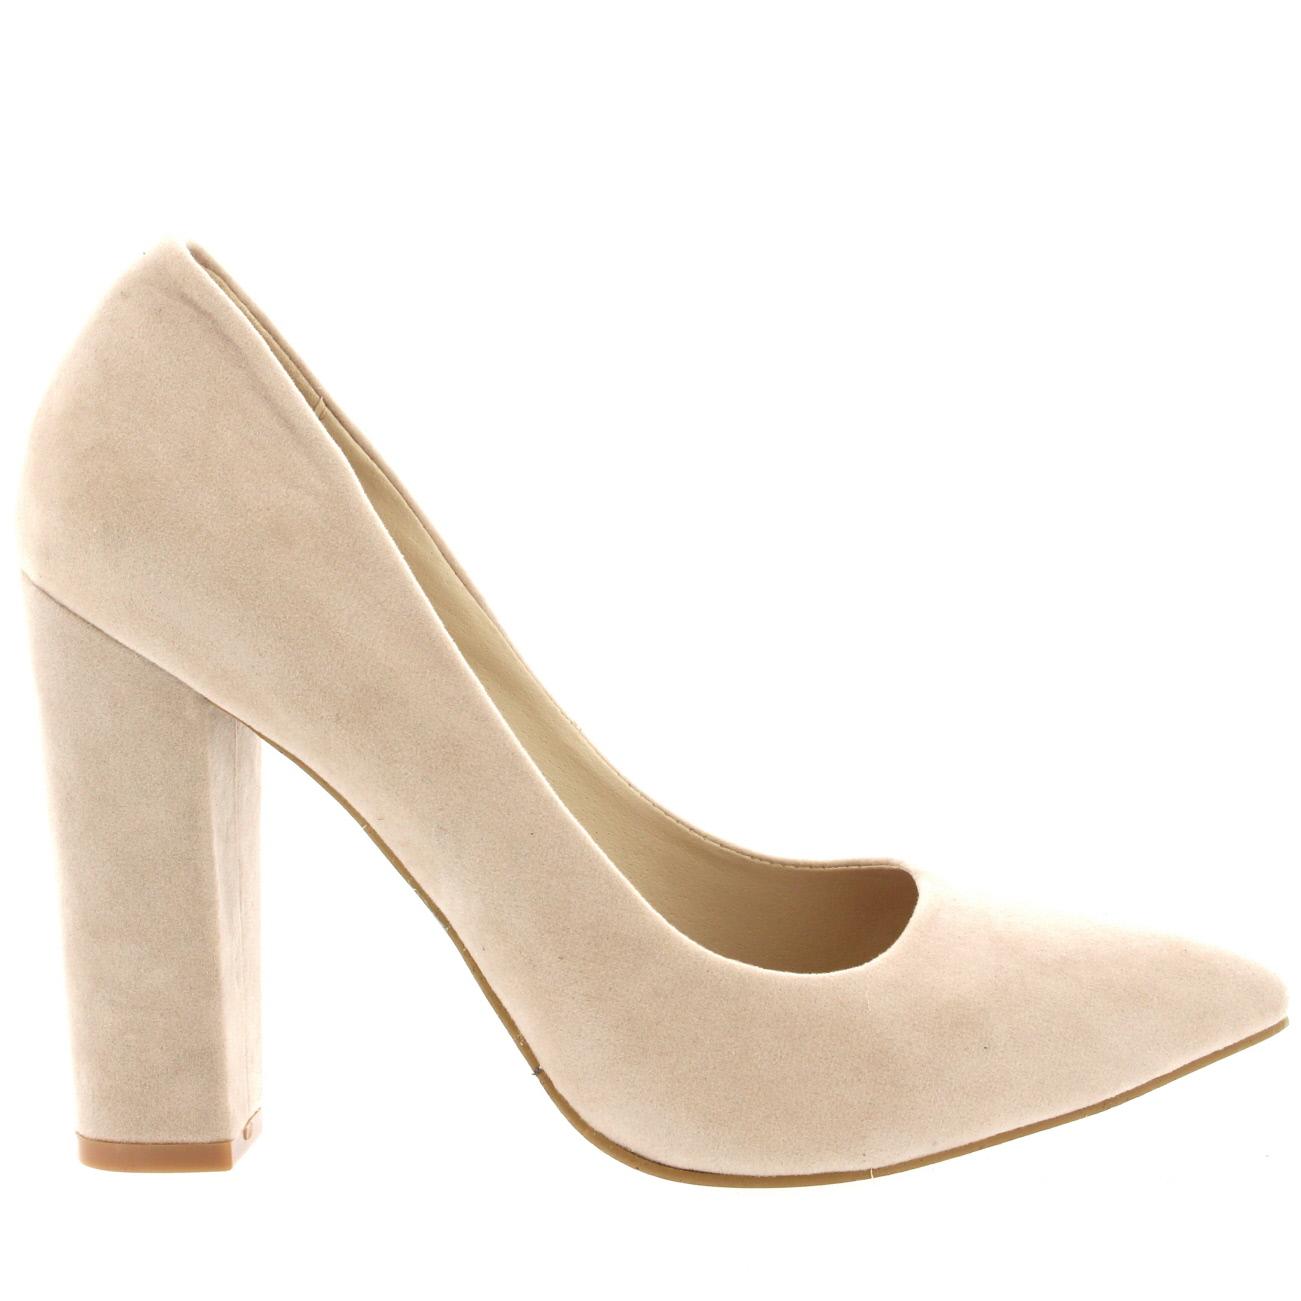 8510837f1 Womens Office Evening Block Heel Pointed Toe Pumps Shoes Work Court Shoe UK  3-10 | eBay